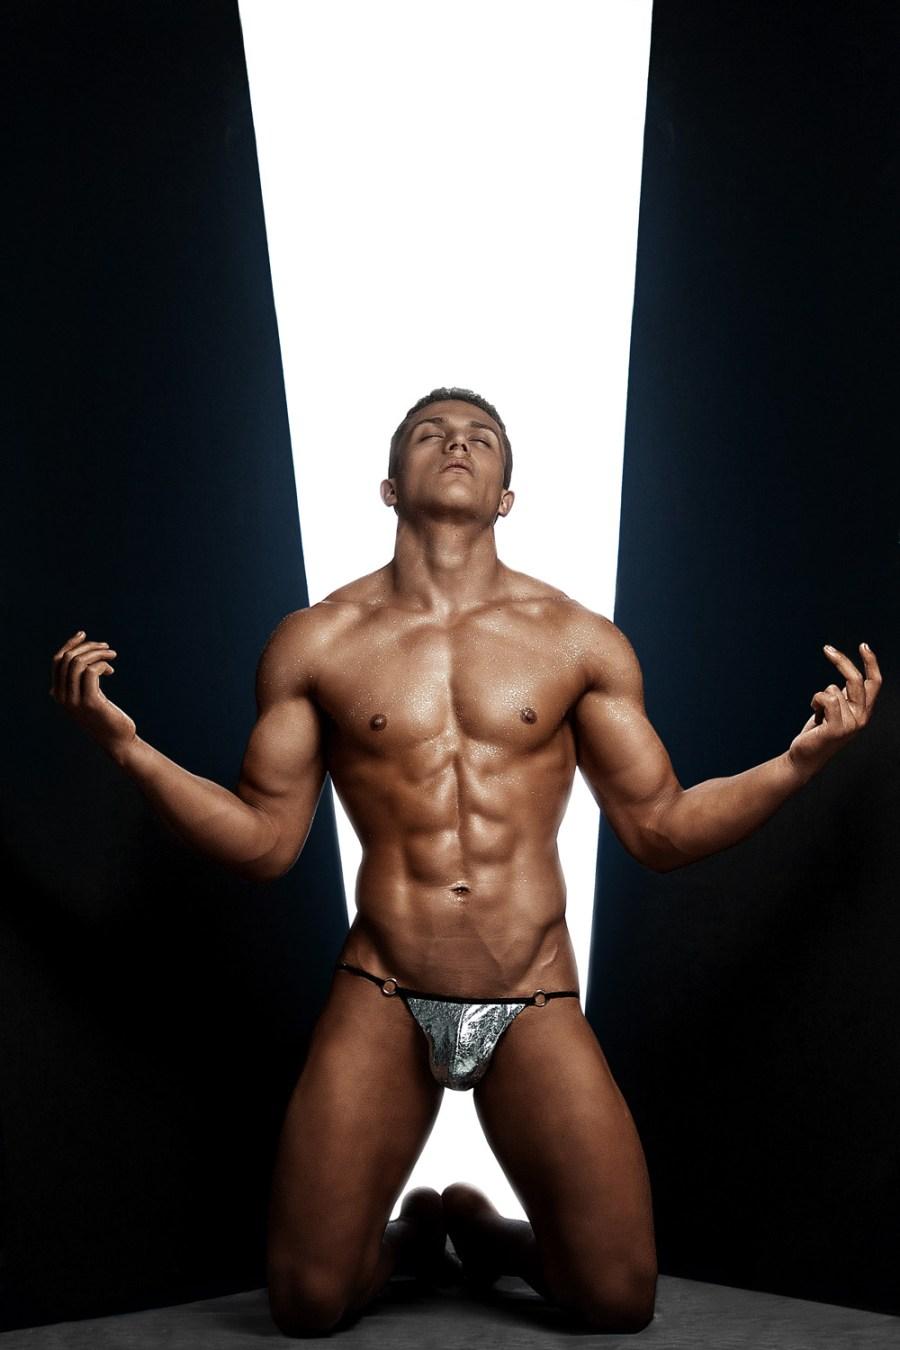 Erik Ramos by Chris Femat for Fashionably Male424